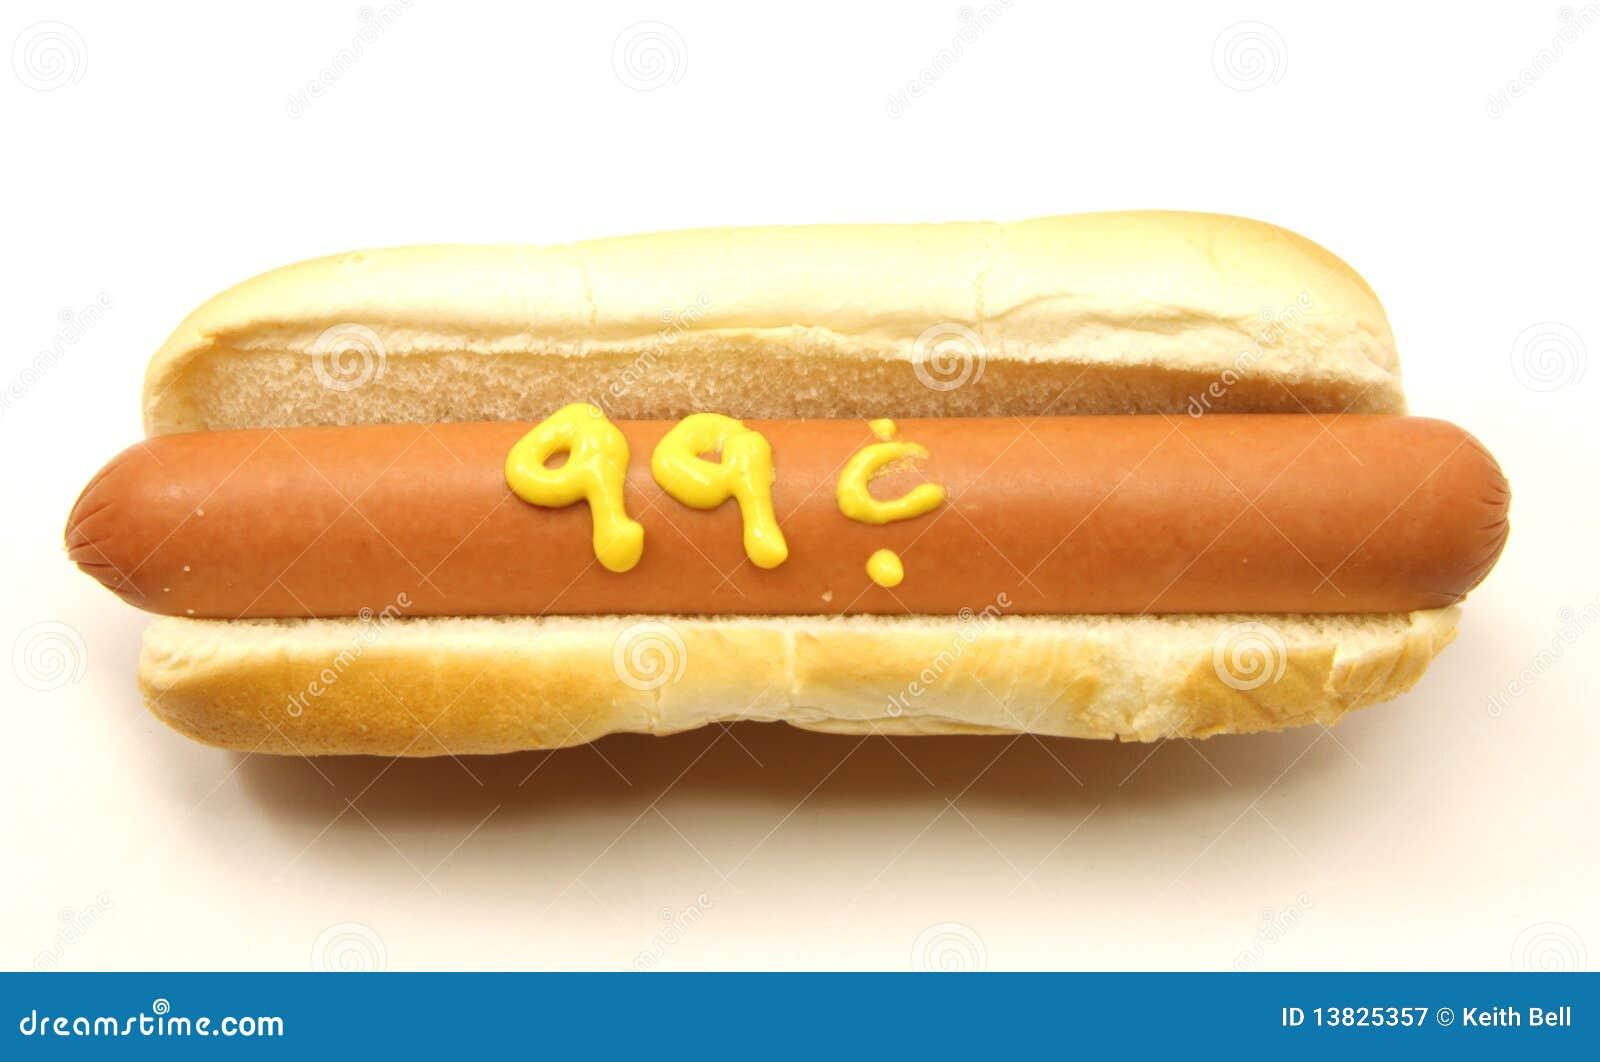 99 Cent Foot Long Hot Dog